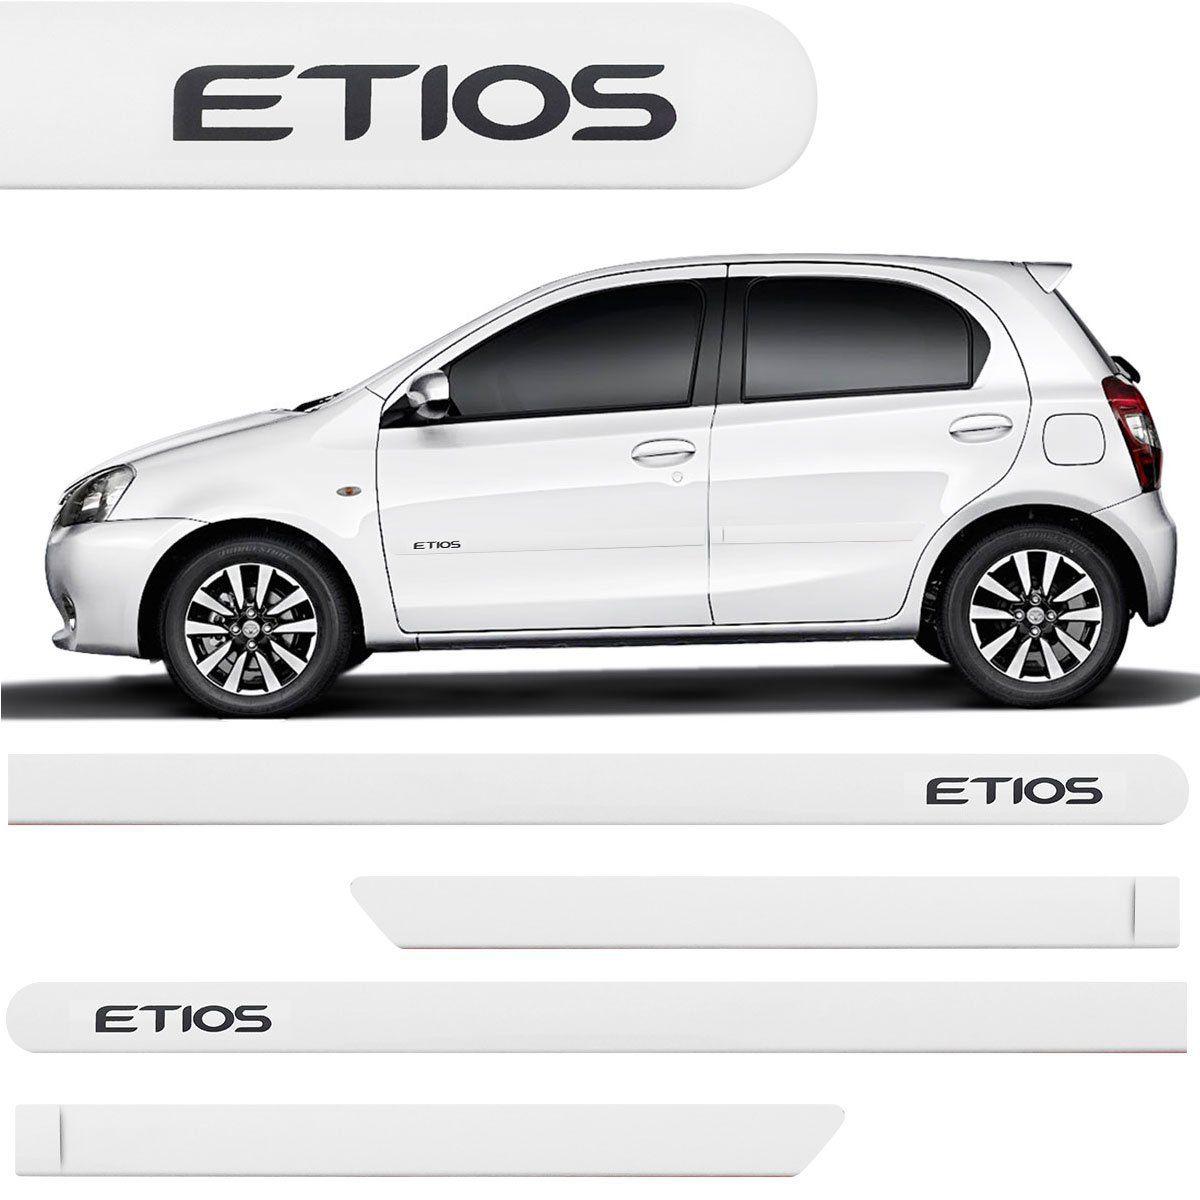 Jogo Friso Lateral Etios Hatch Sedan 2012 2013 2014 2015 2016 Branco Polar